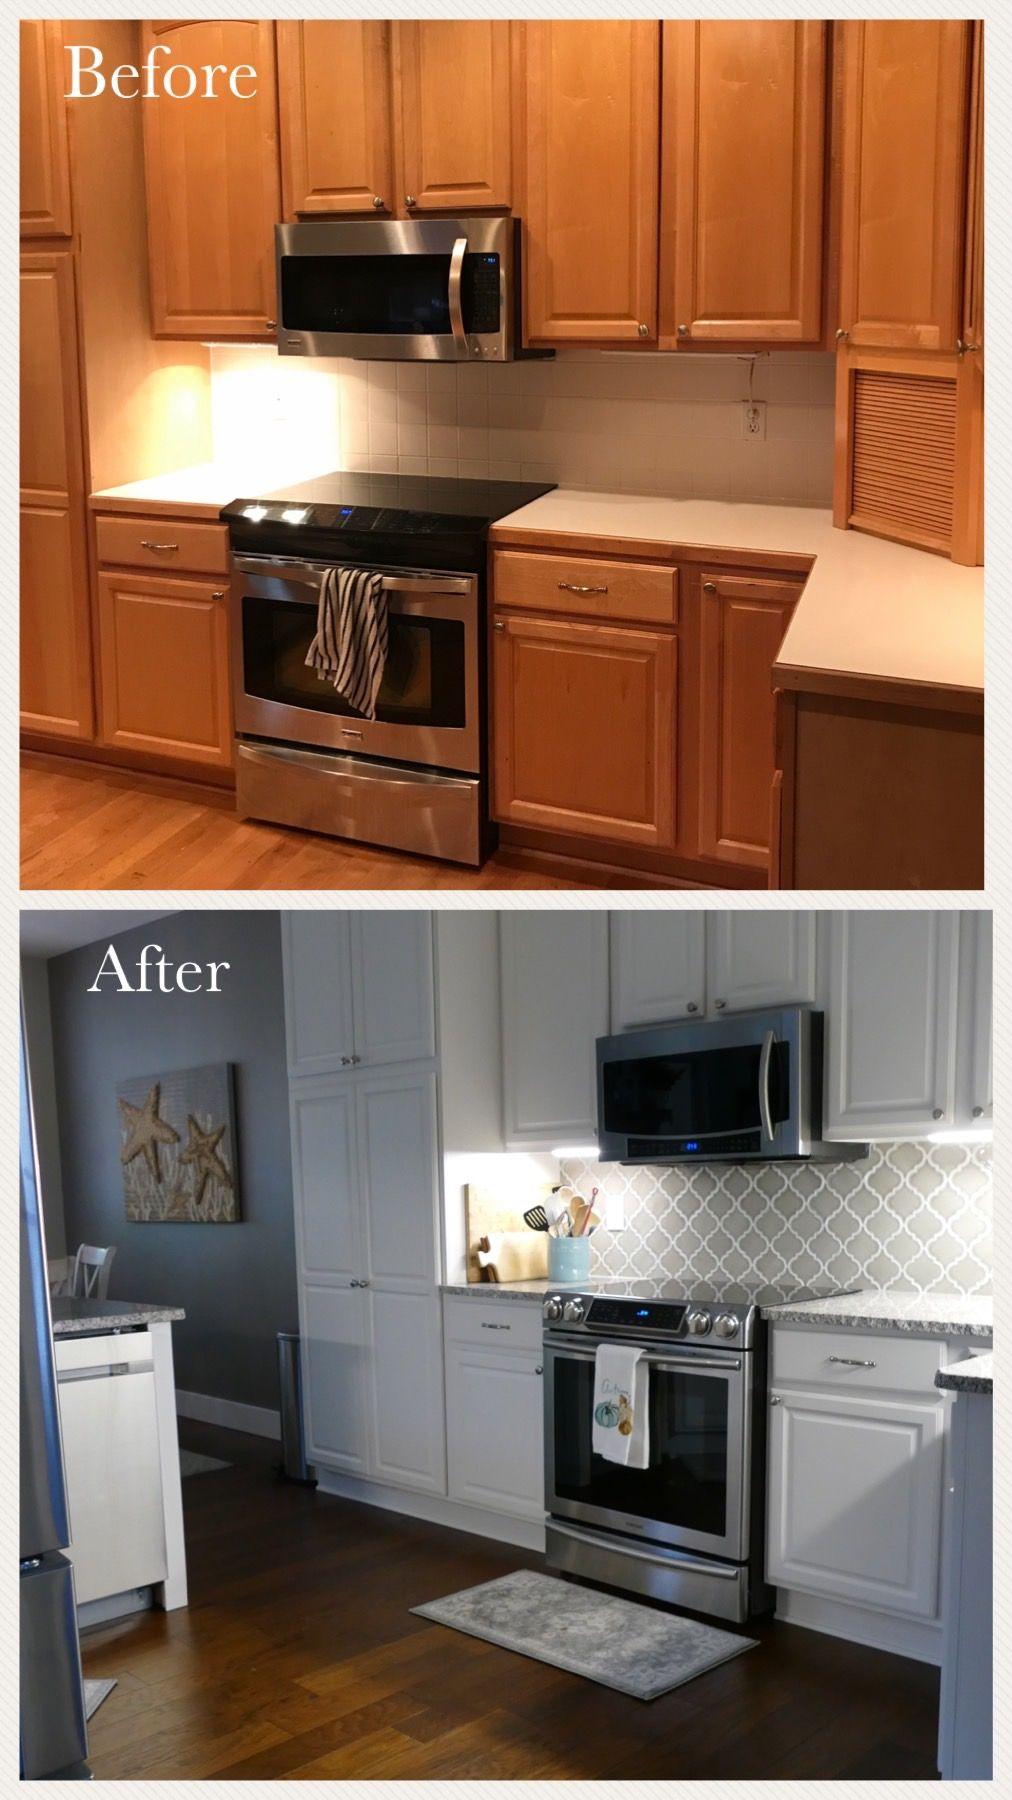 Kitchen Remodel Before After Dove Gray Arabesque Backsplash Painted White Cabinets M Kitchen Cabinets Painted Grey Grey Painted Kitchen Kitchen Remodel